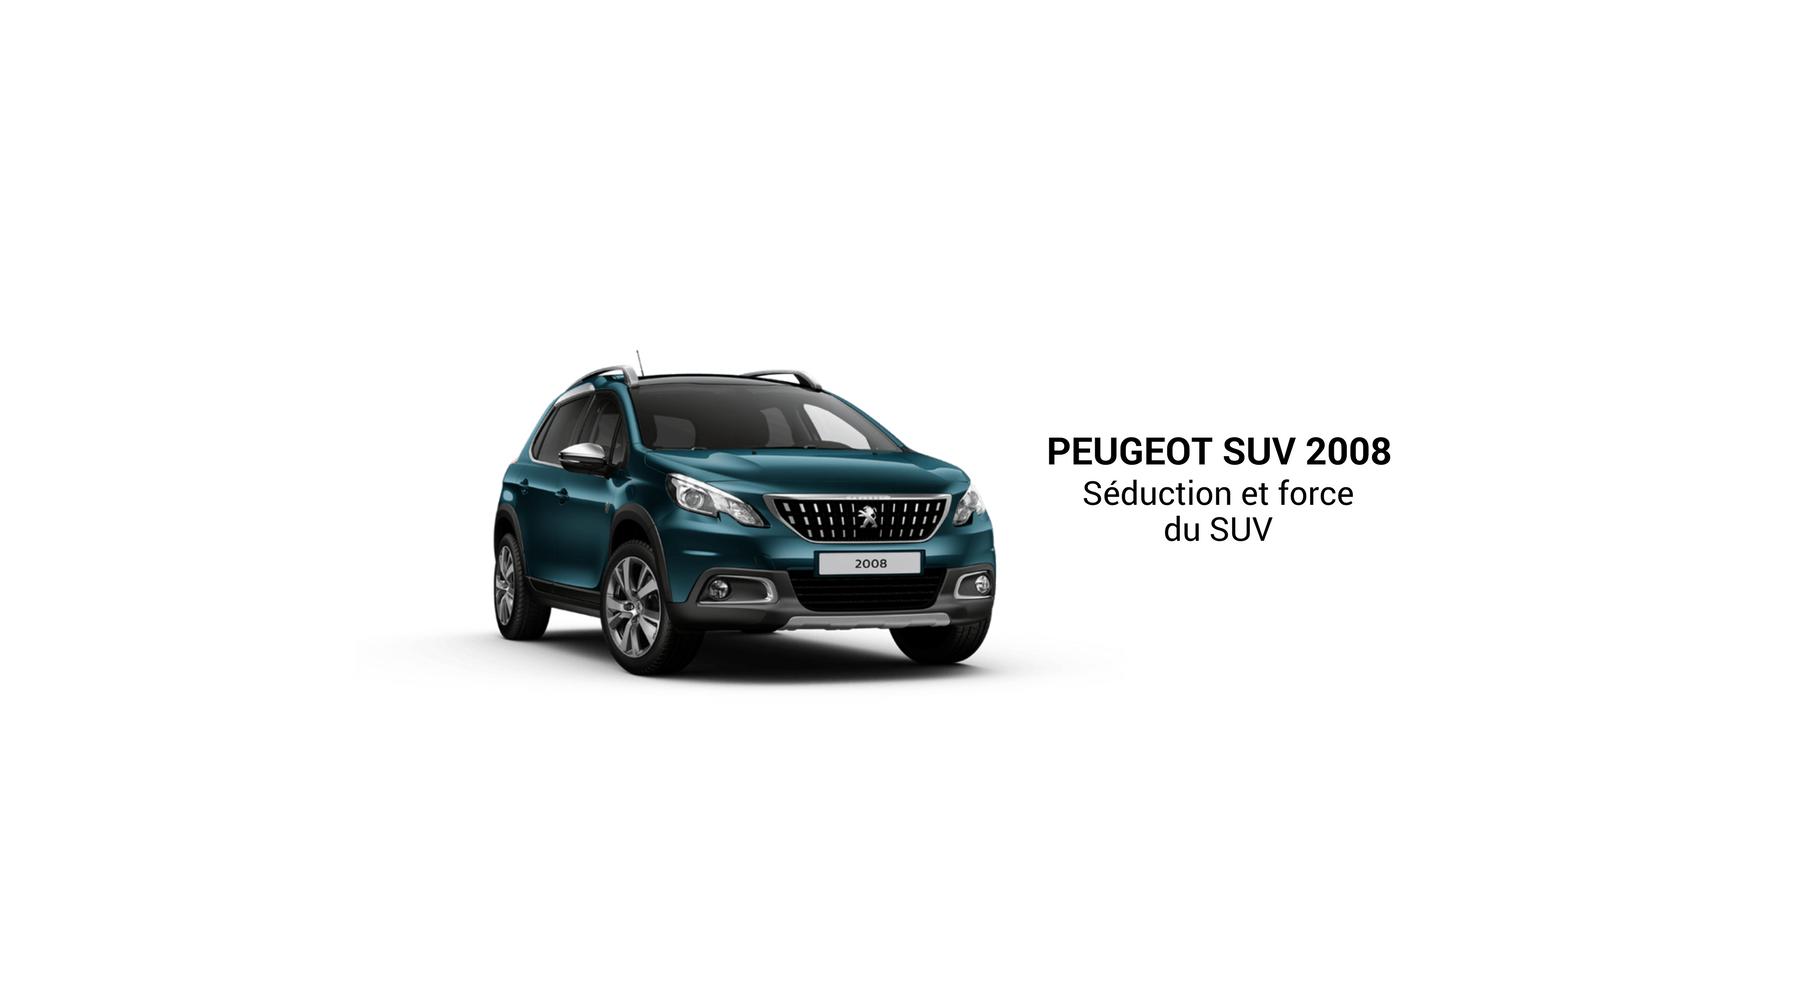 Peugeot SUV 2008.png